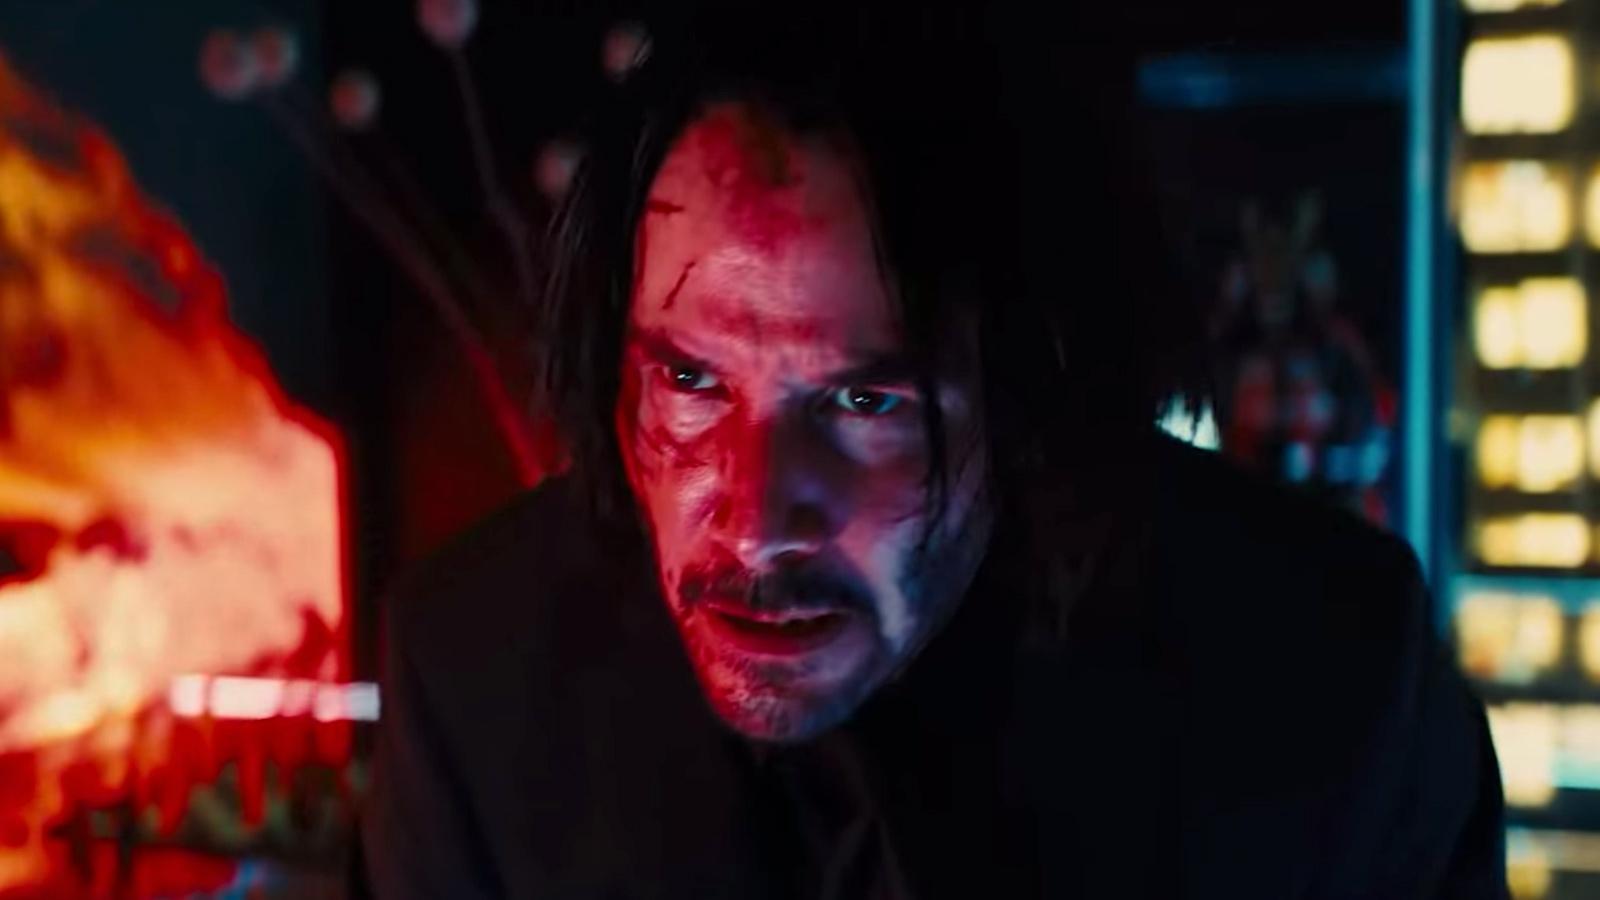 See Keanu Reeves, Halle Berry Rack Up Kills in Insane New 'John Wick 3' Trailer